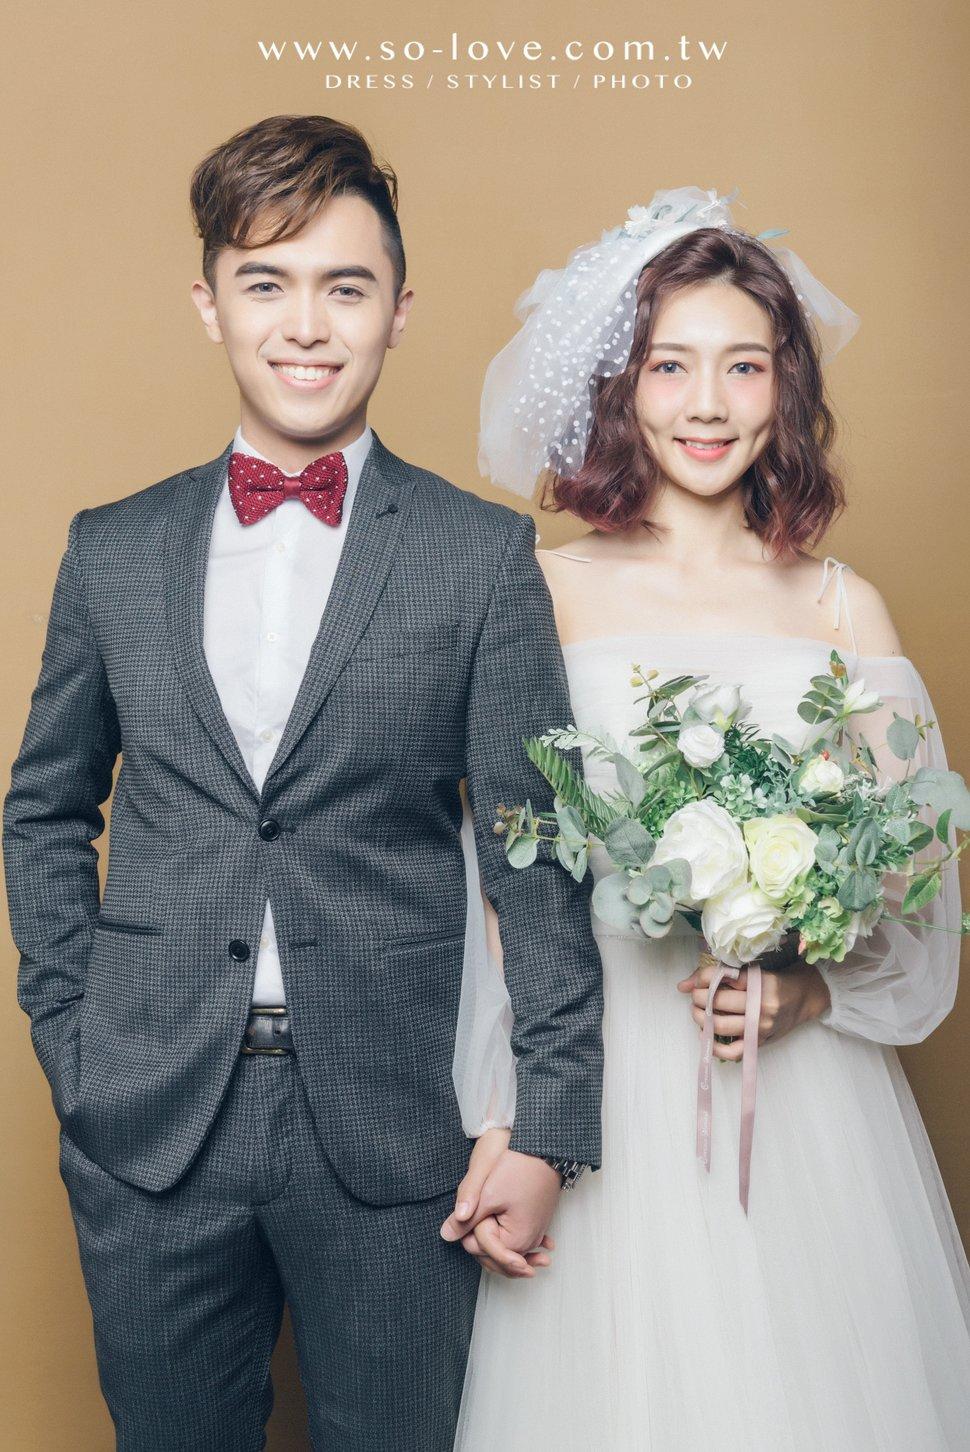 YDSC_5193 - So.Love Wedding 樂樂蕾絲《結婚吧》